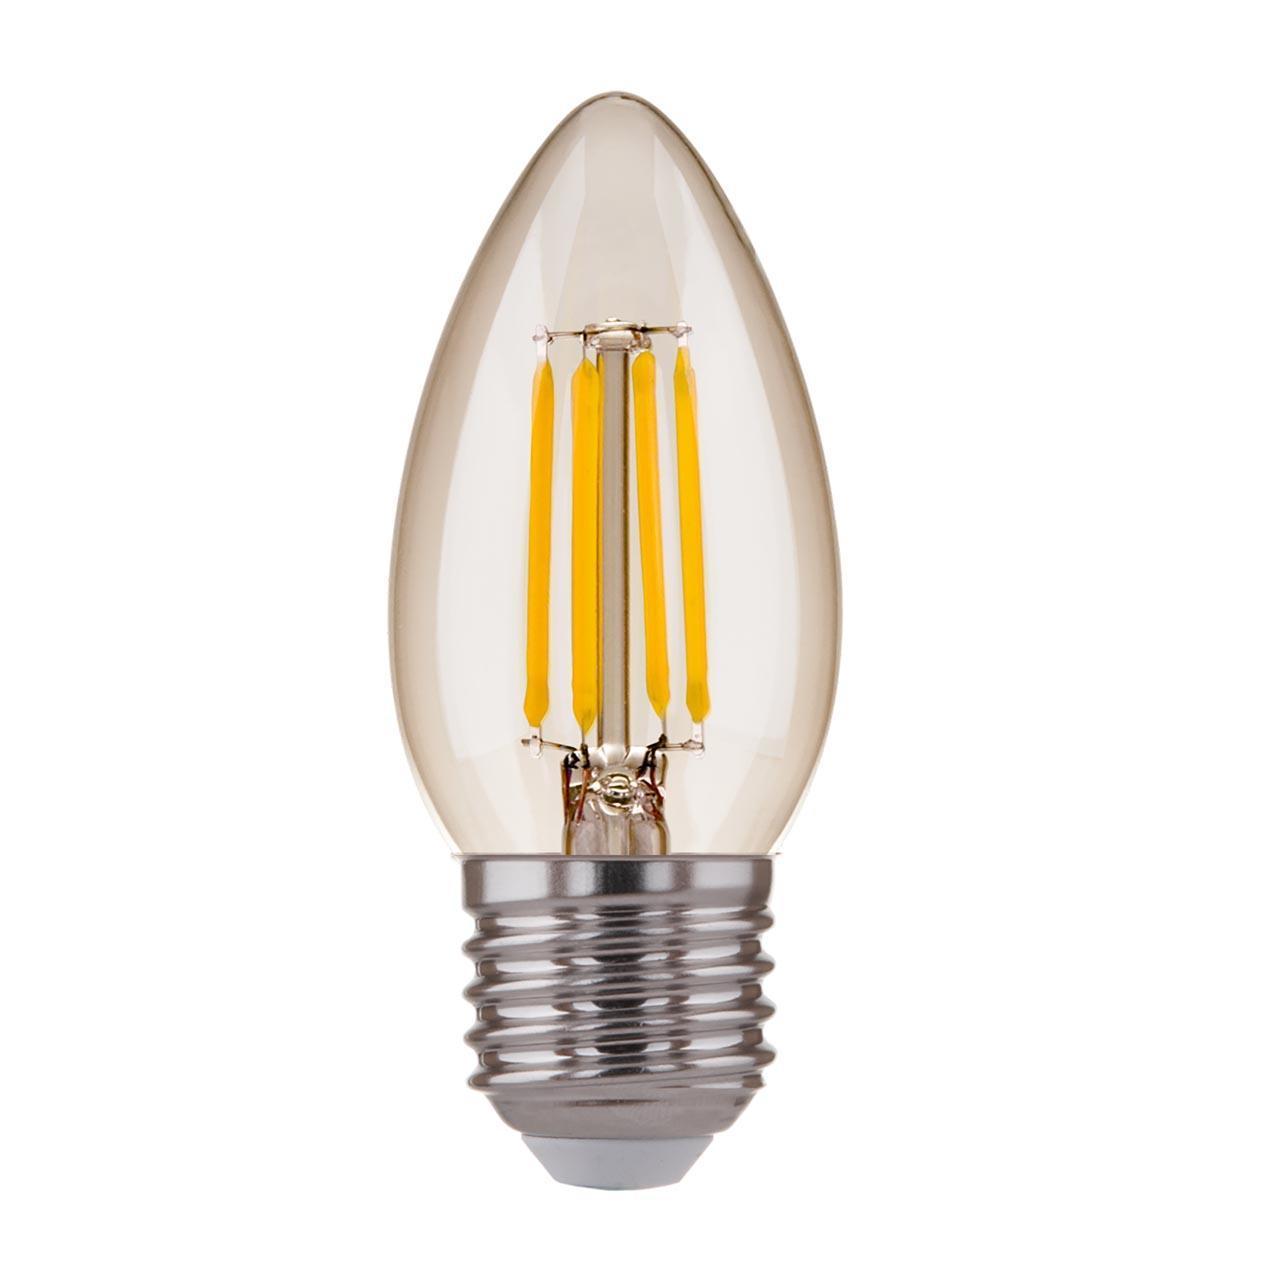 Лампа светодиодная филаментная E27 7W 4200K прозрачная 4690389125263 лампы светодиодная elektrostandard classic led d 7w 4200k e27